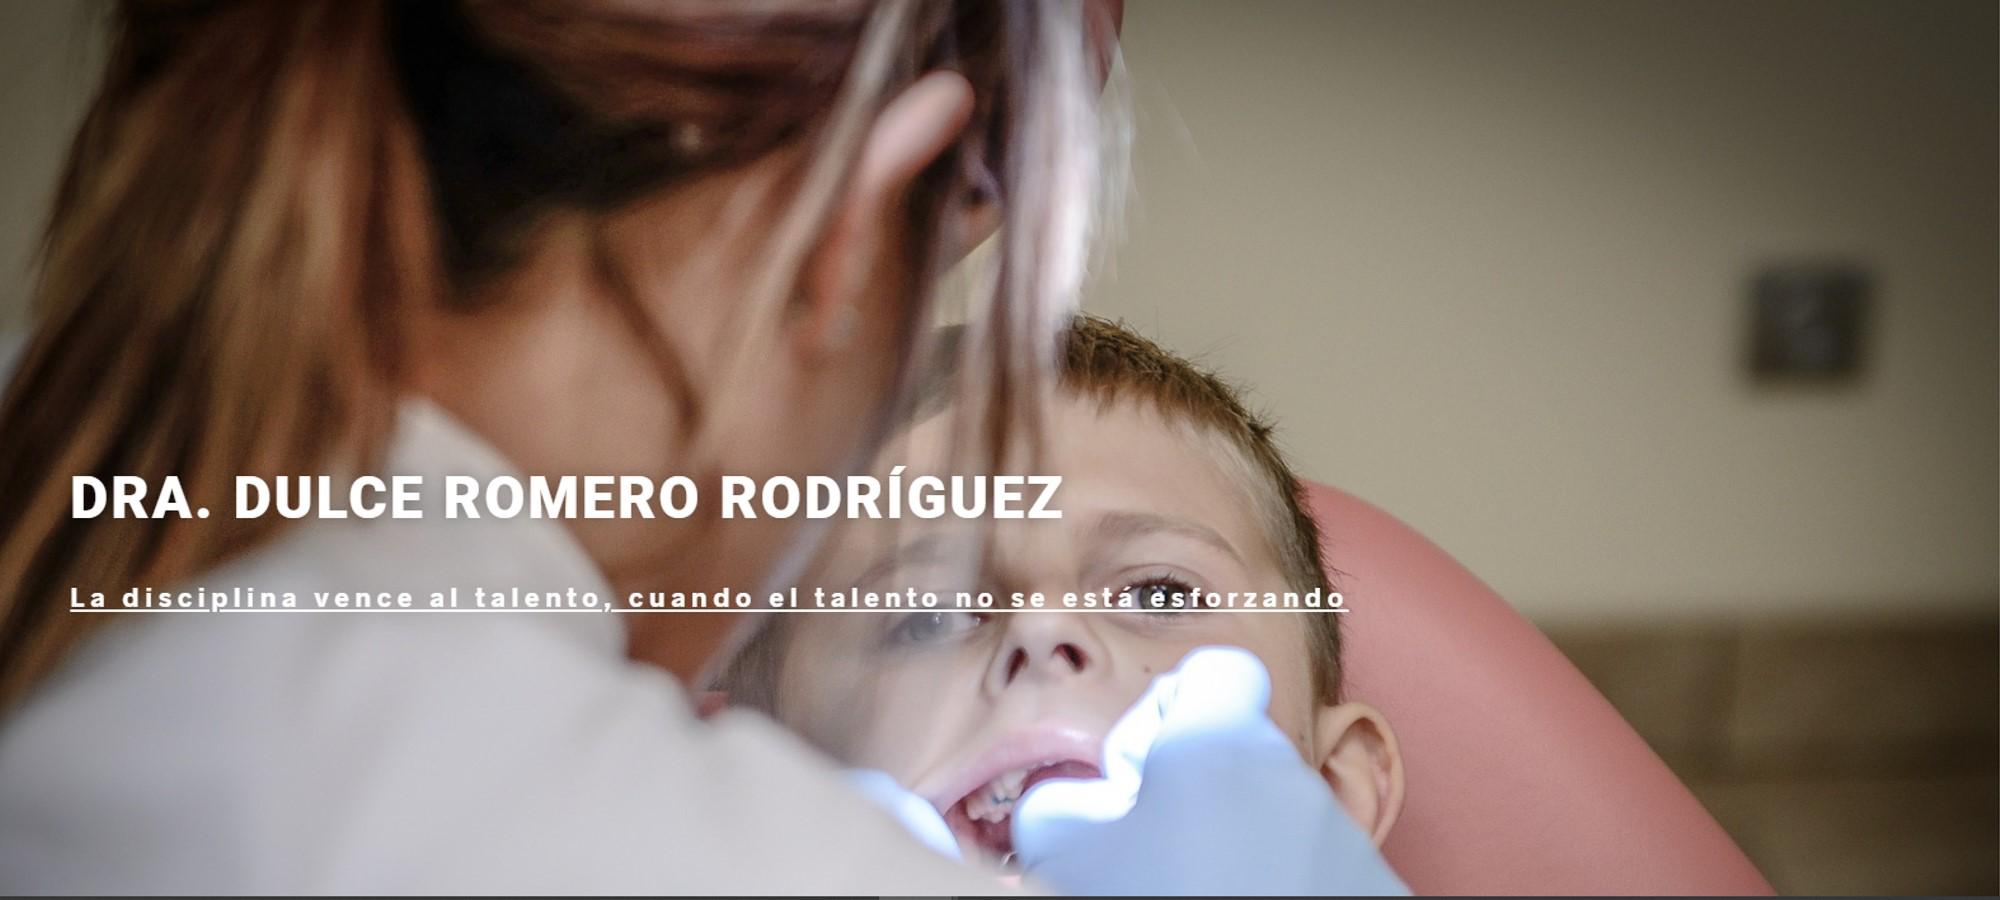 https://saludenlinea.com.mx/dra-dulce-romero/